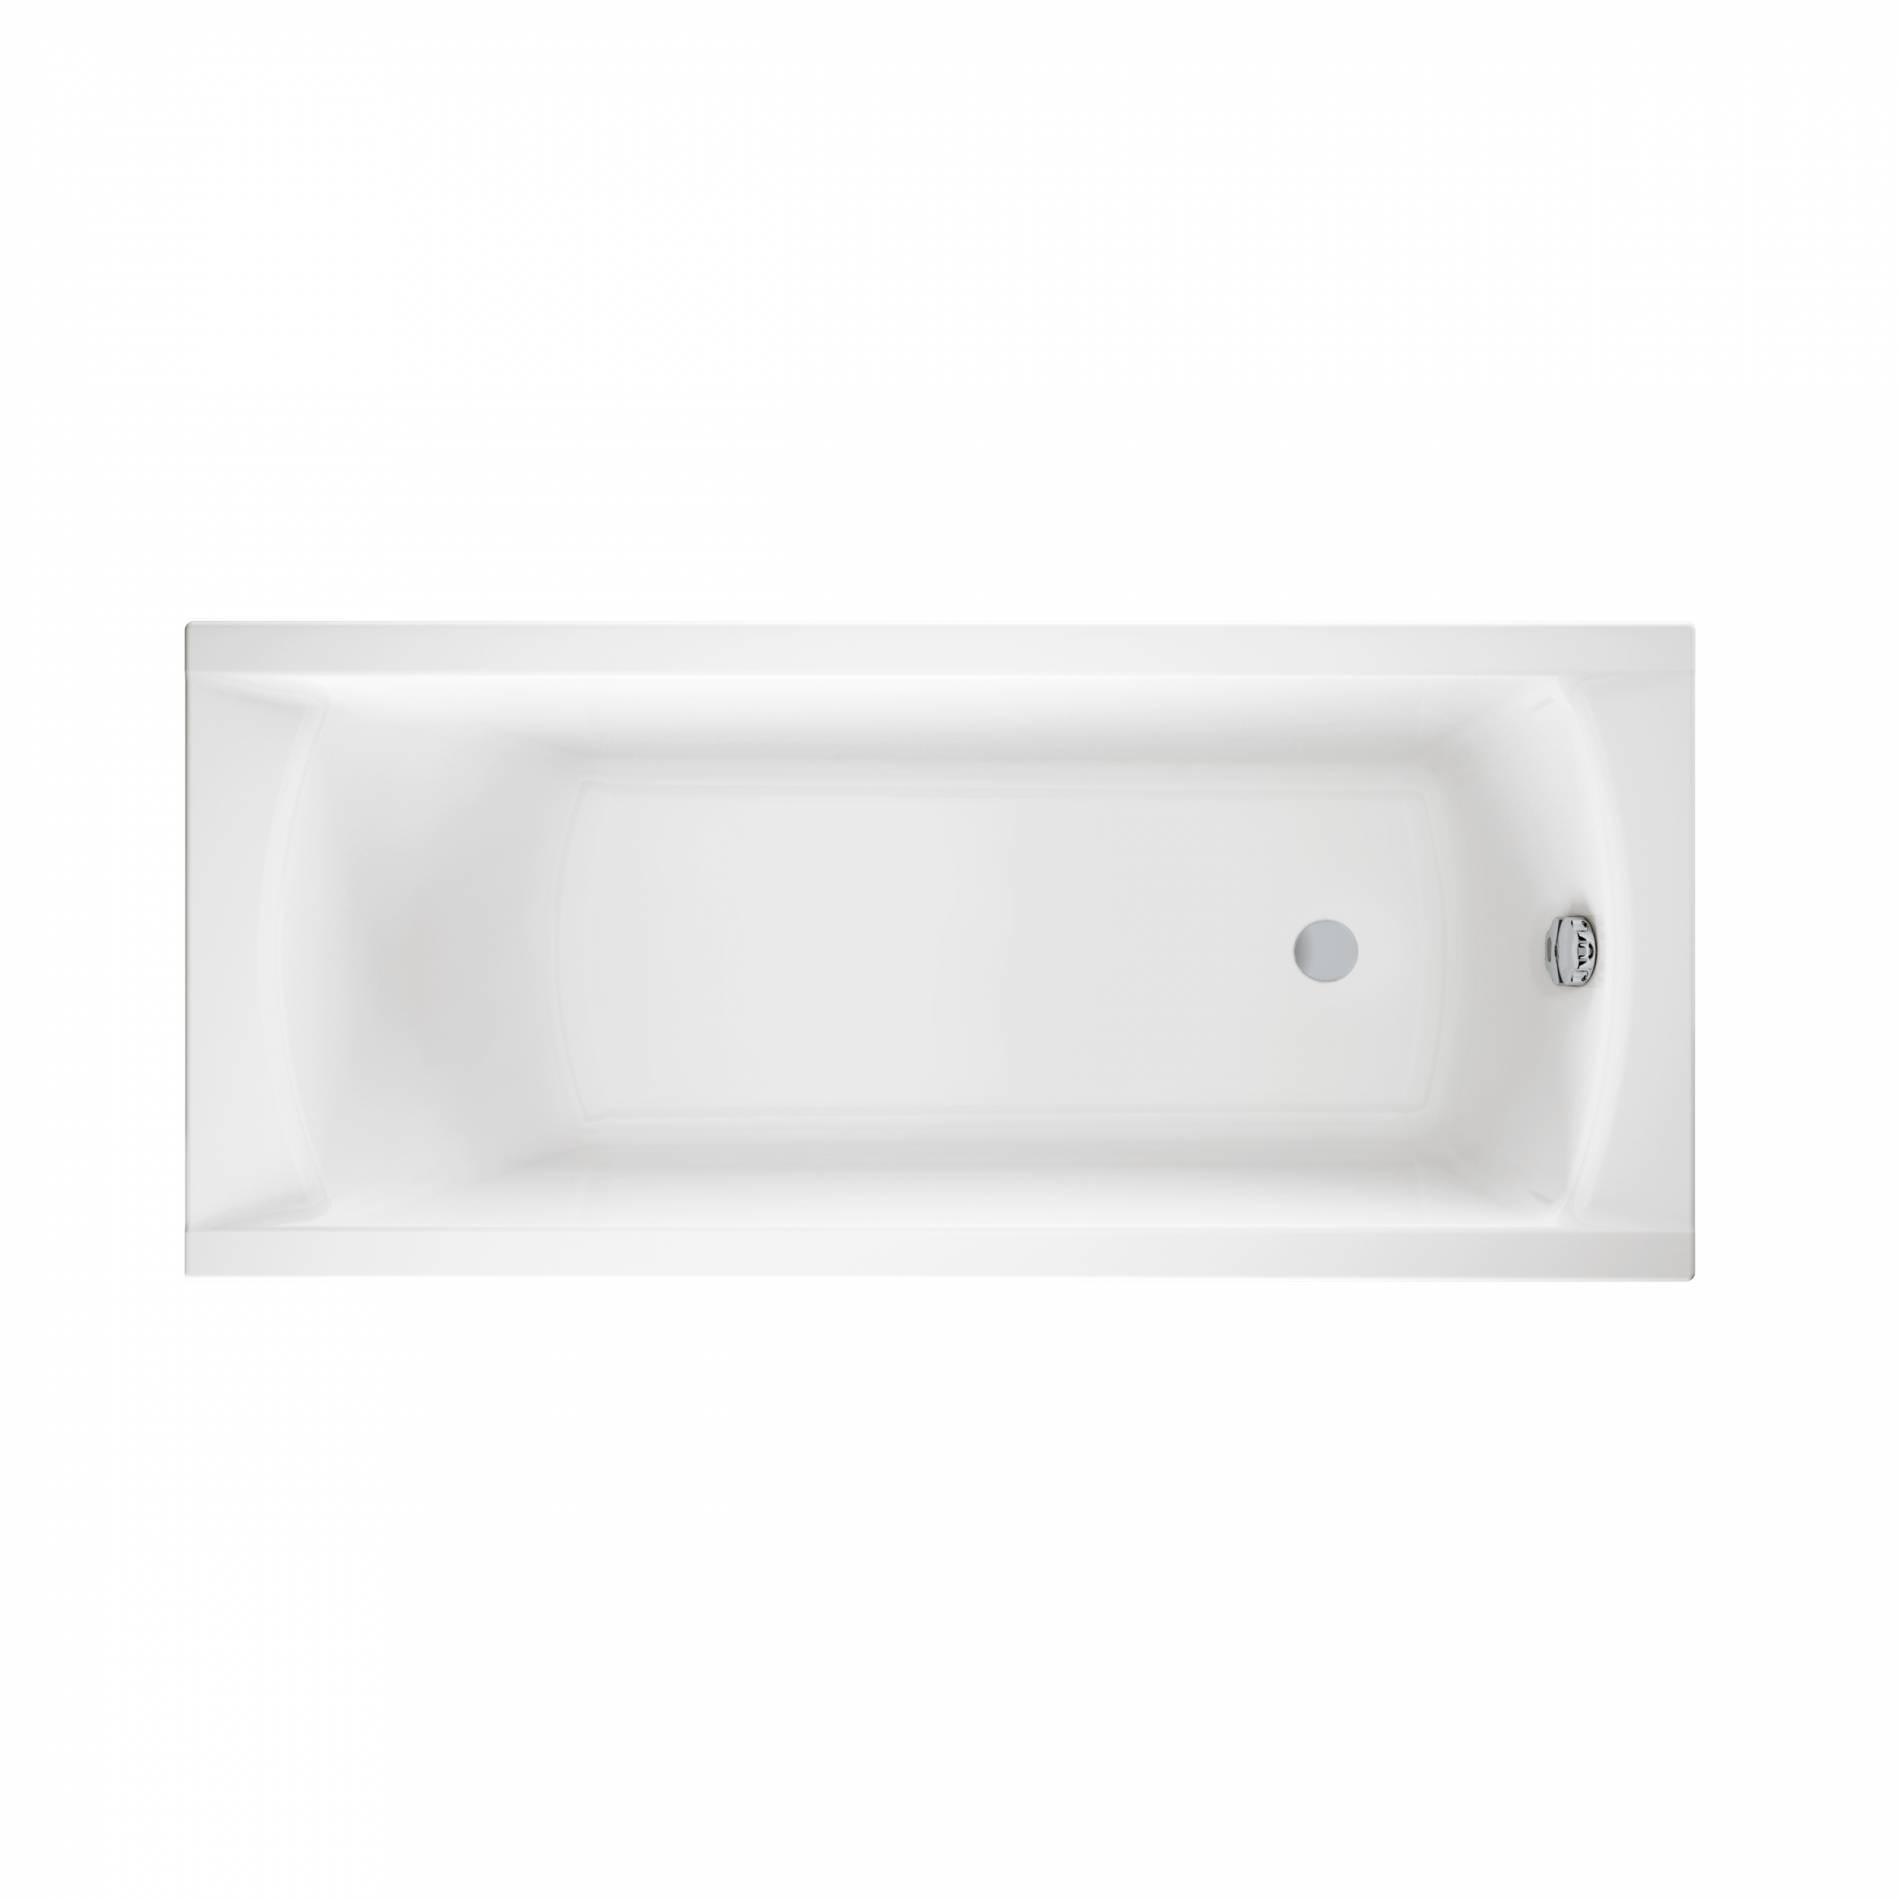 Ванна акрилова CERSANIT KORAT 170*70